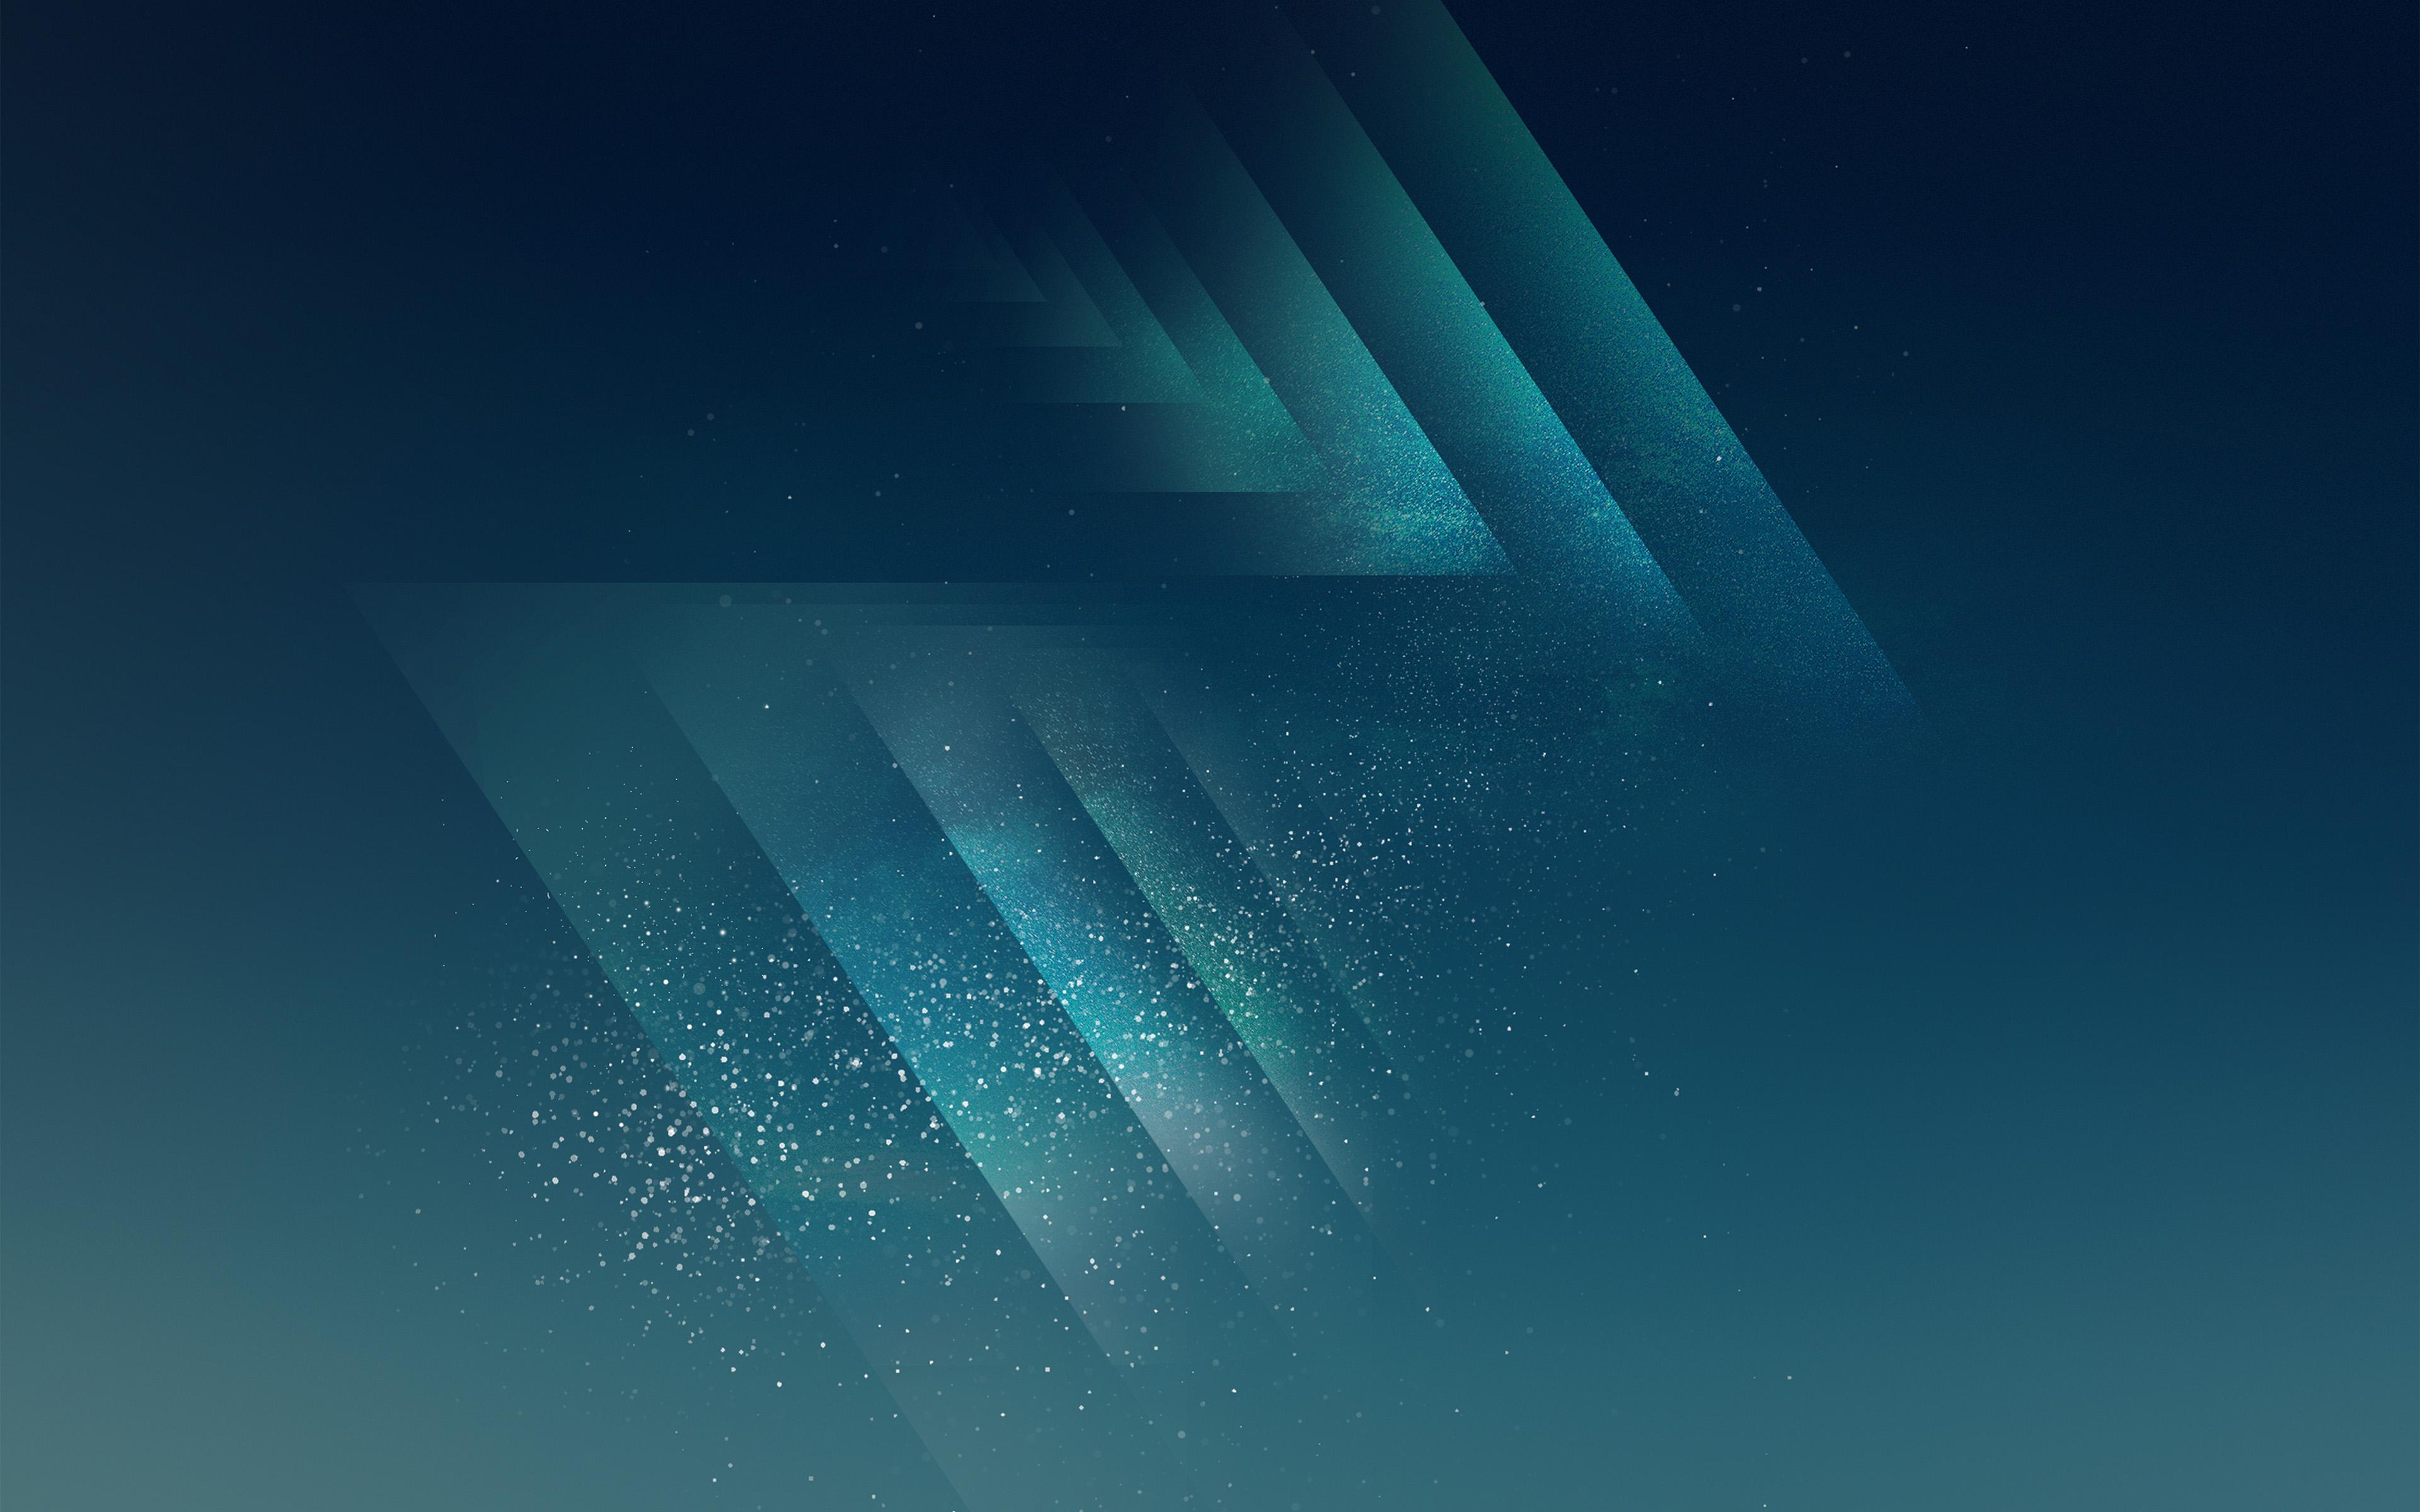 Vw08 Galaxy S8 Android Dark Blue Star Pattern Background Wallpaper